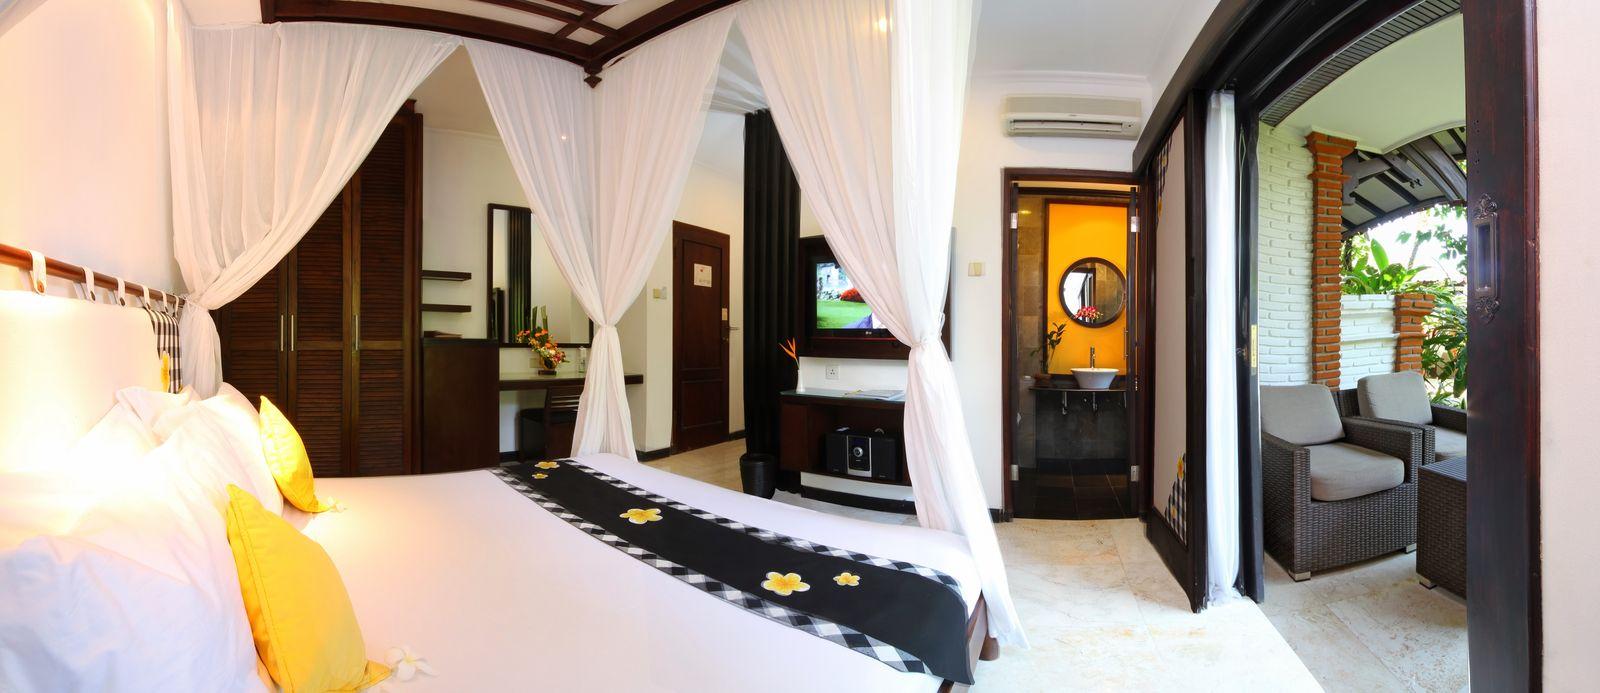 indonesien-bali-candi-dasa-candi-beach-resort-spa-room-deluxe-garden